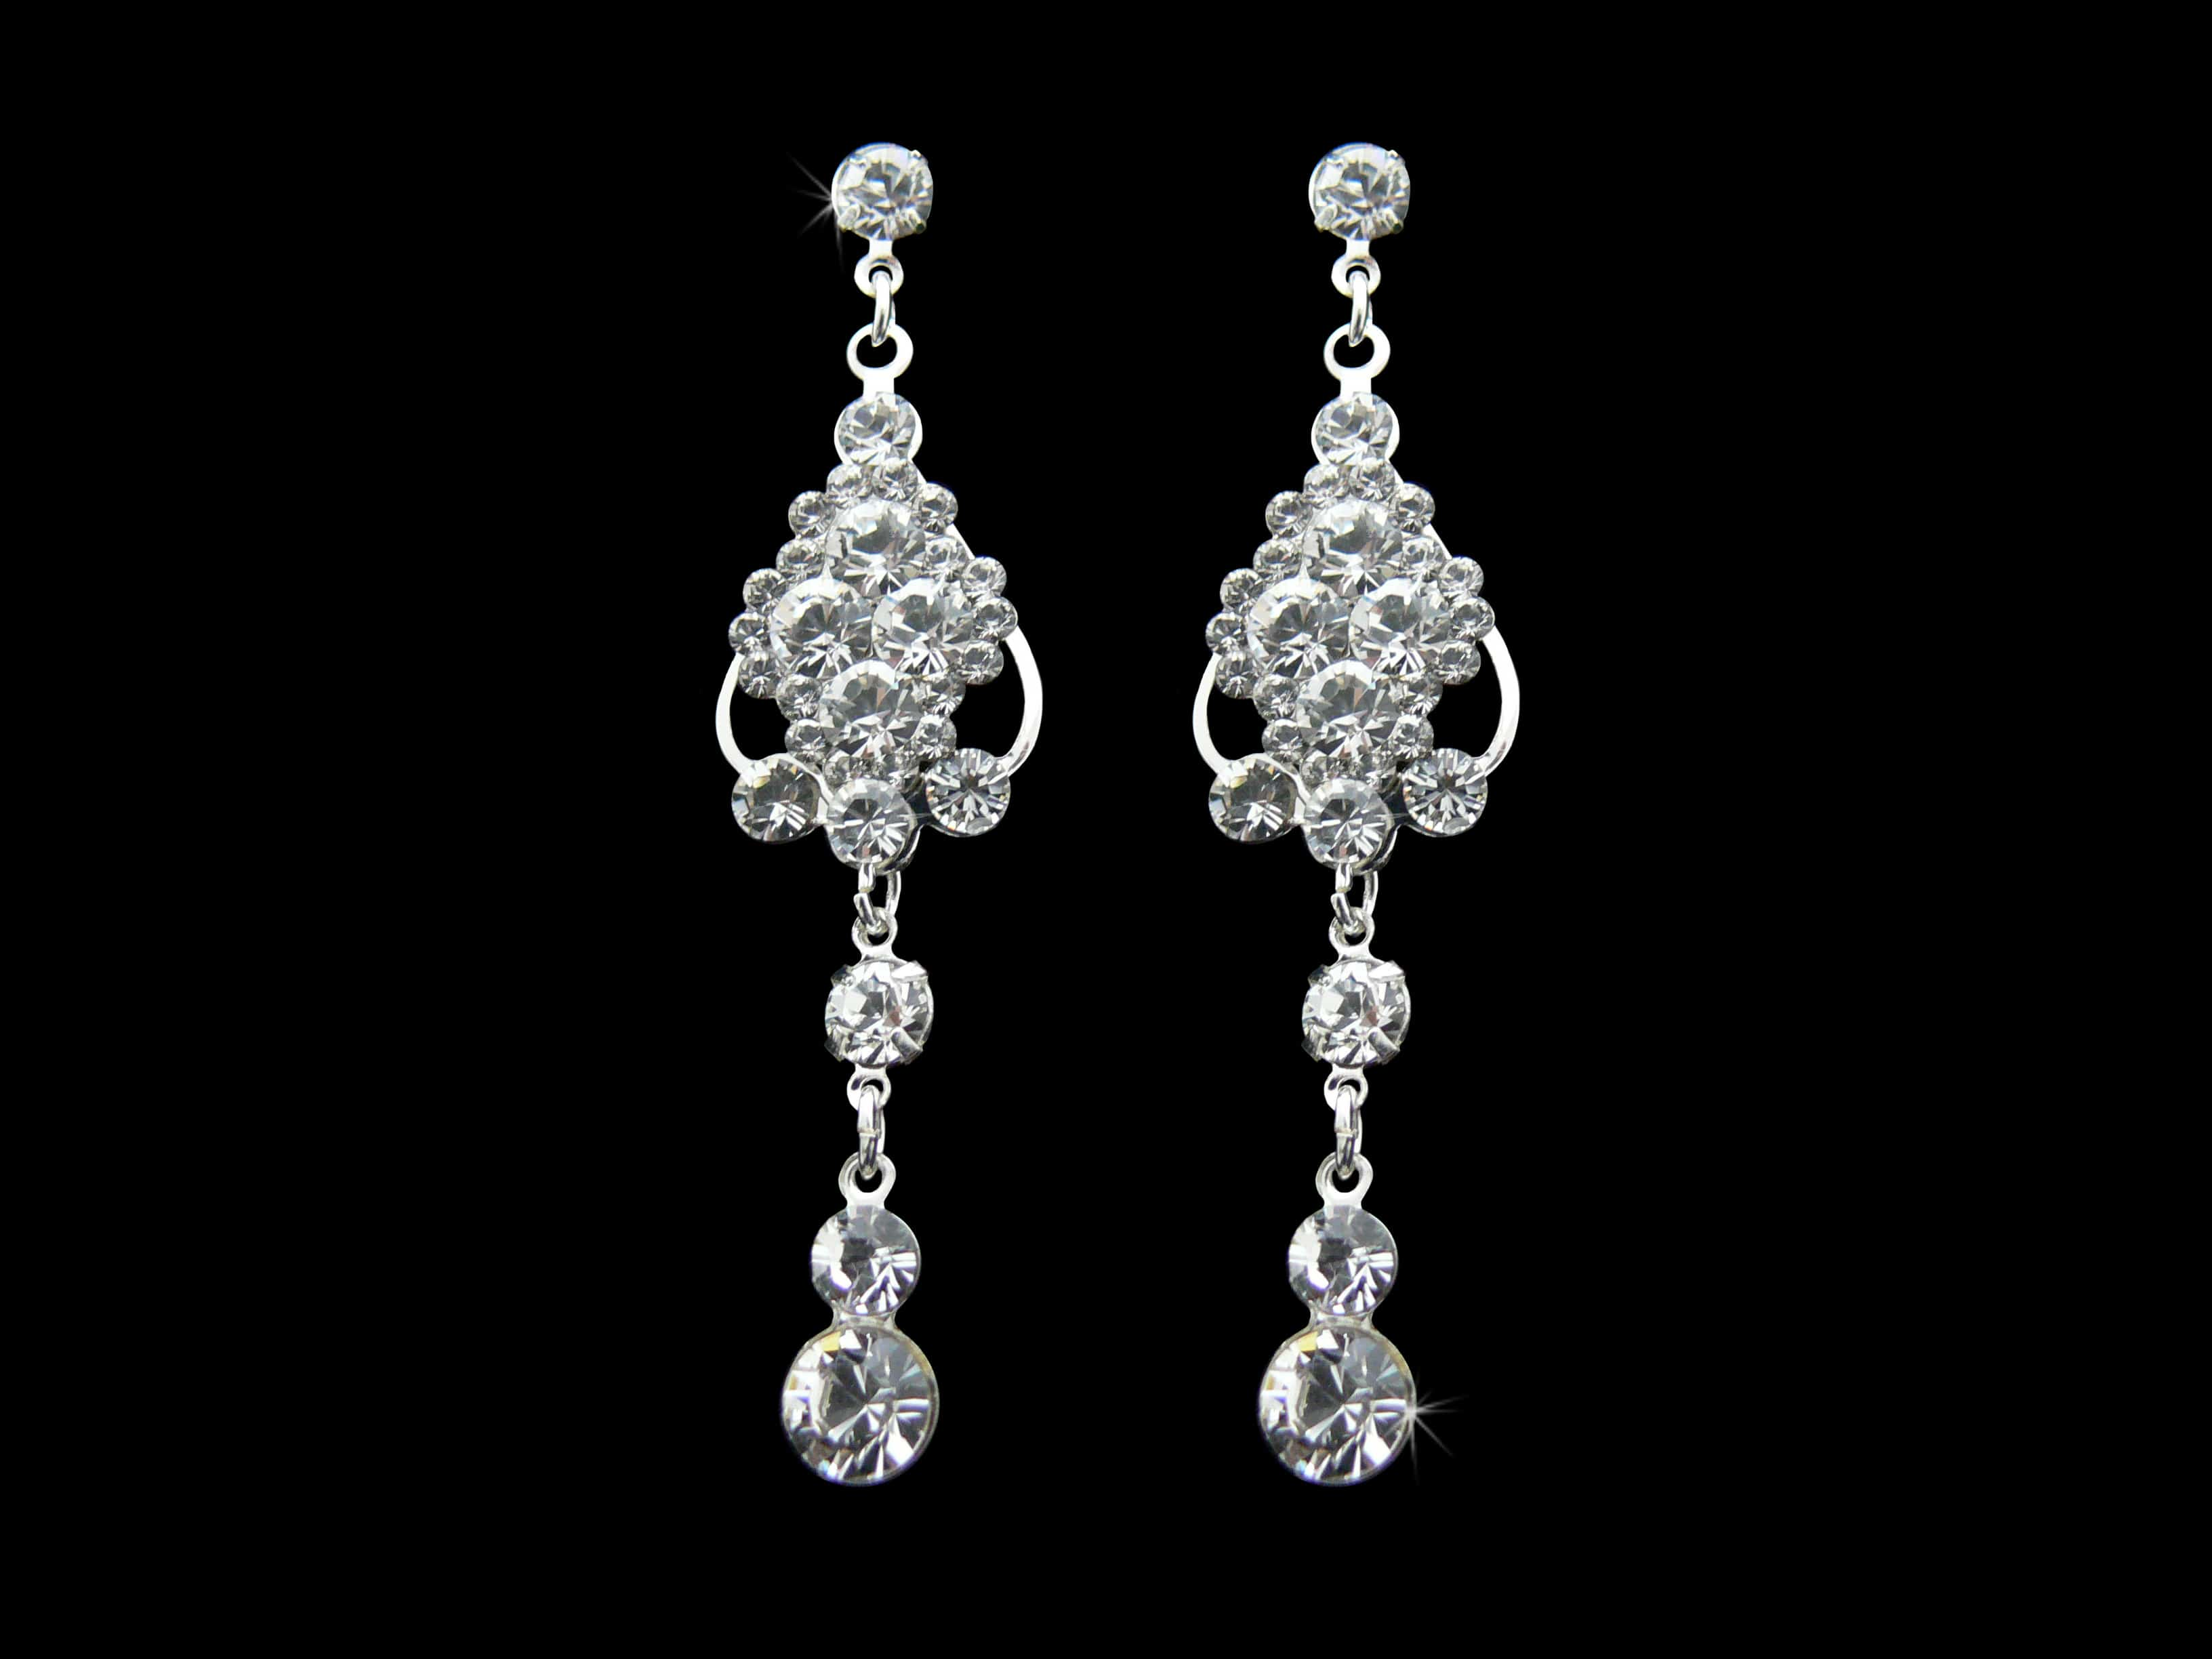 Carolina Drop Earrings from Vinka Design Bridal Accessories